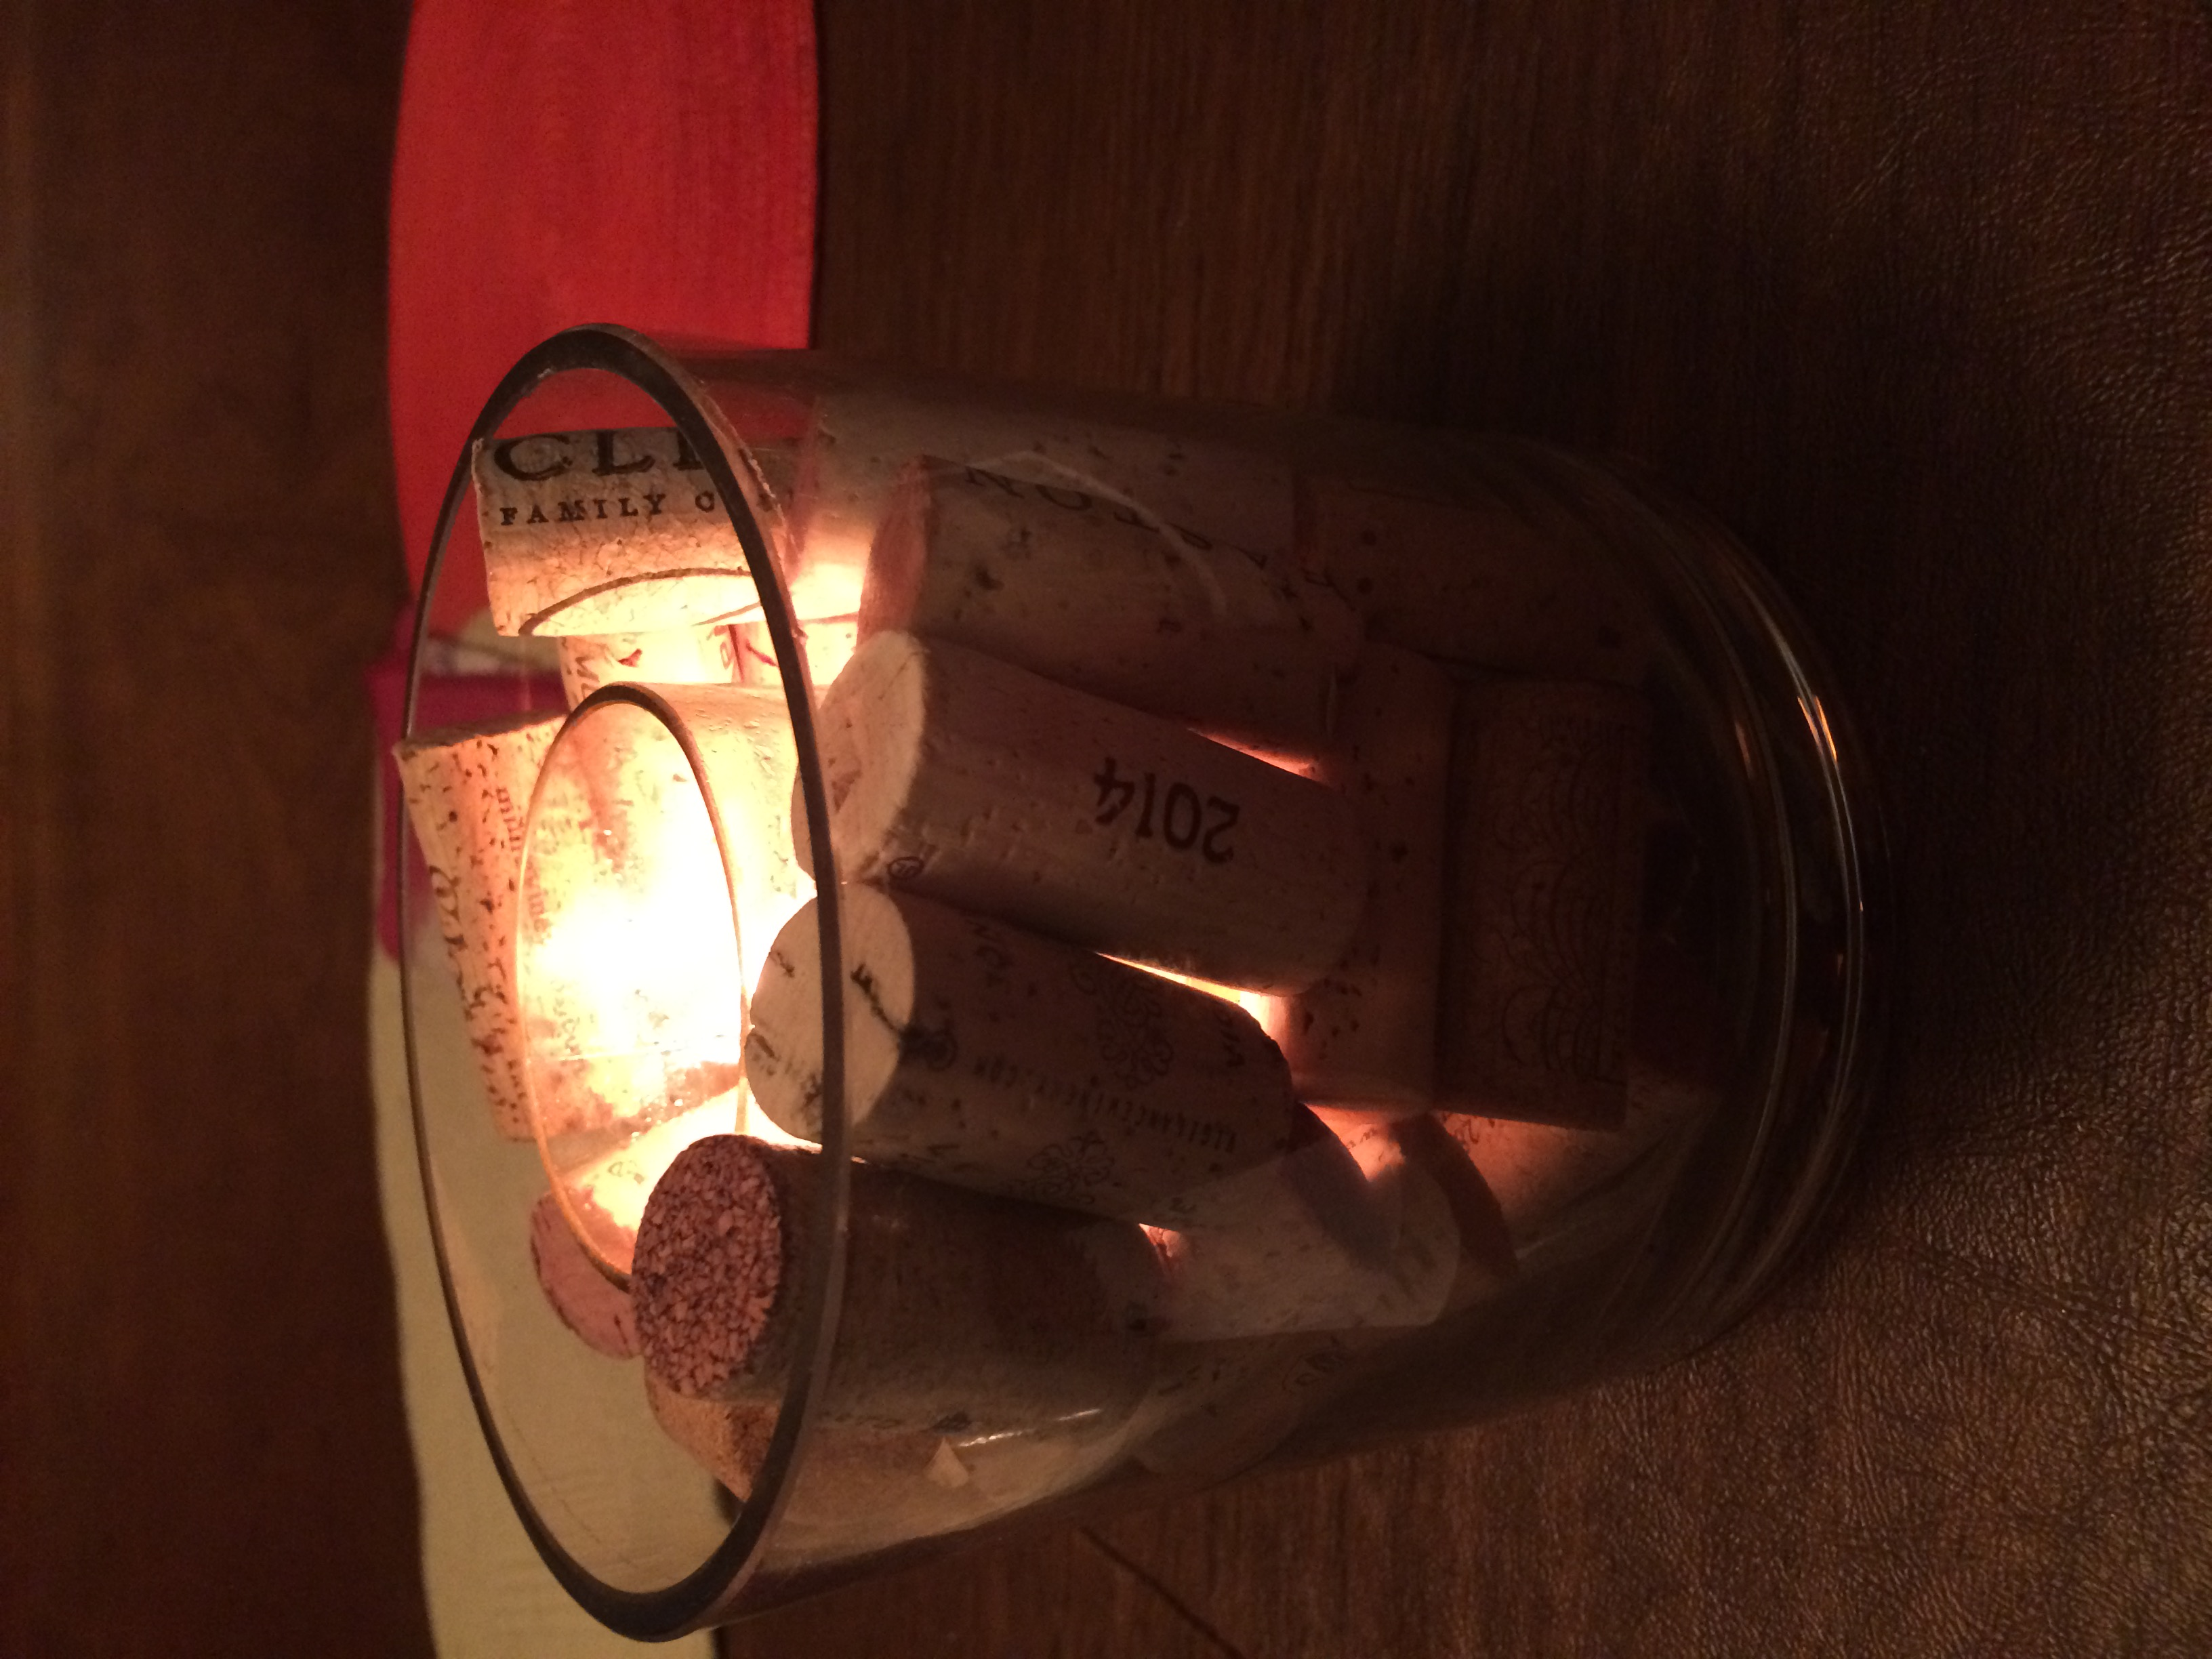 Corkcourri Candle at Night